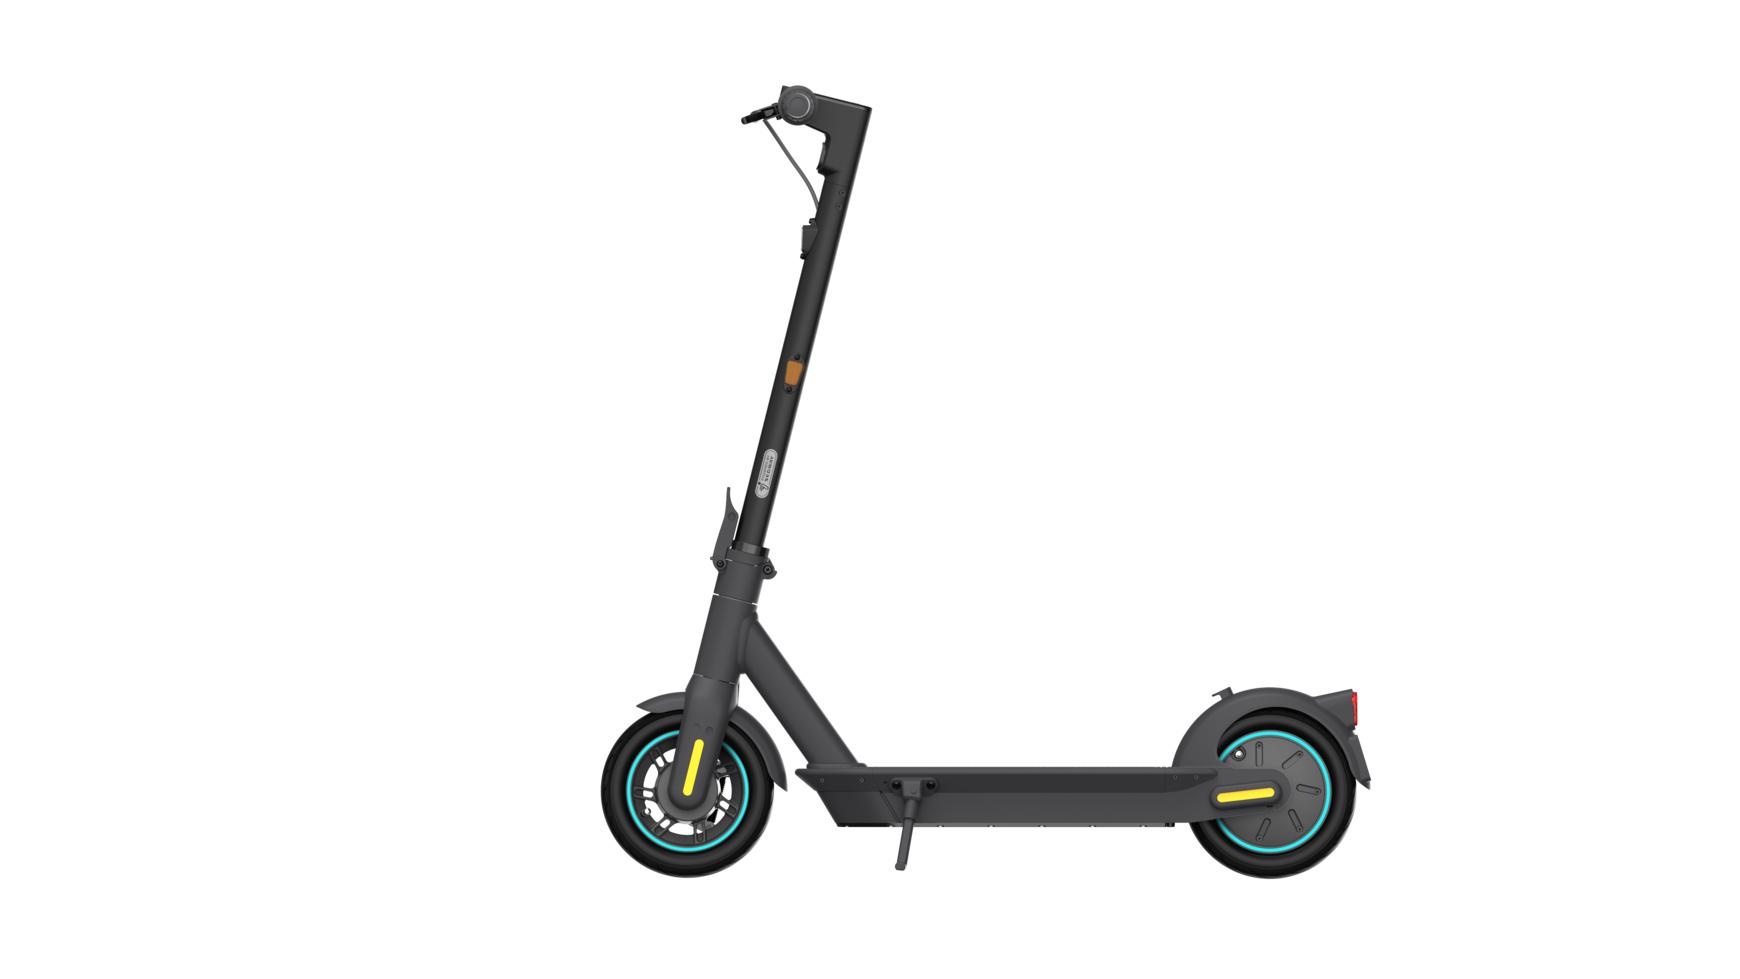 3802025-Ninebot-Segway-KickScooter-MAX-G30D-II-main